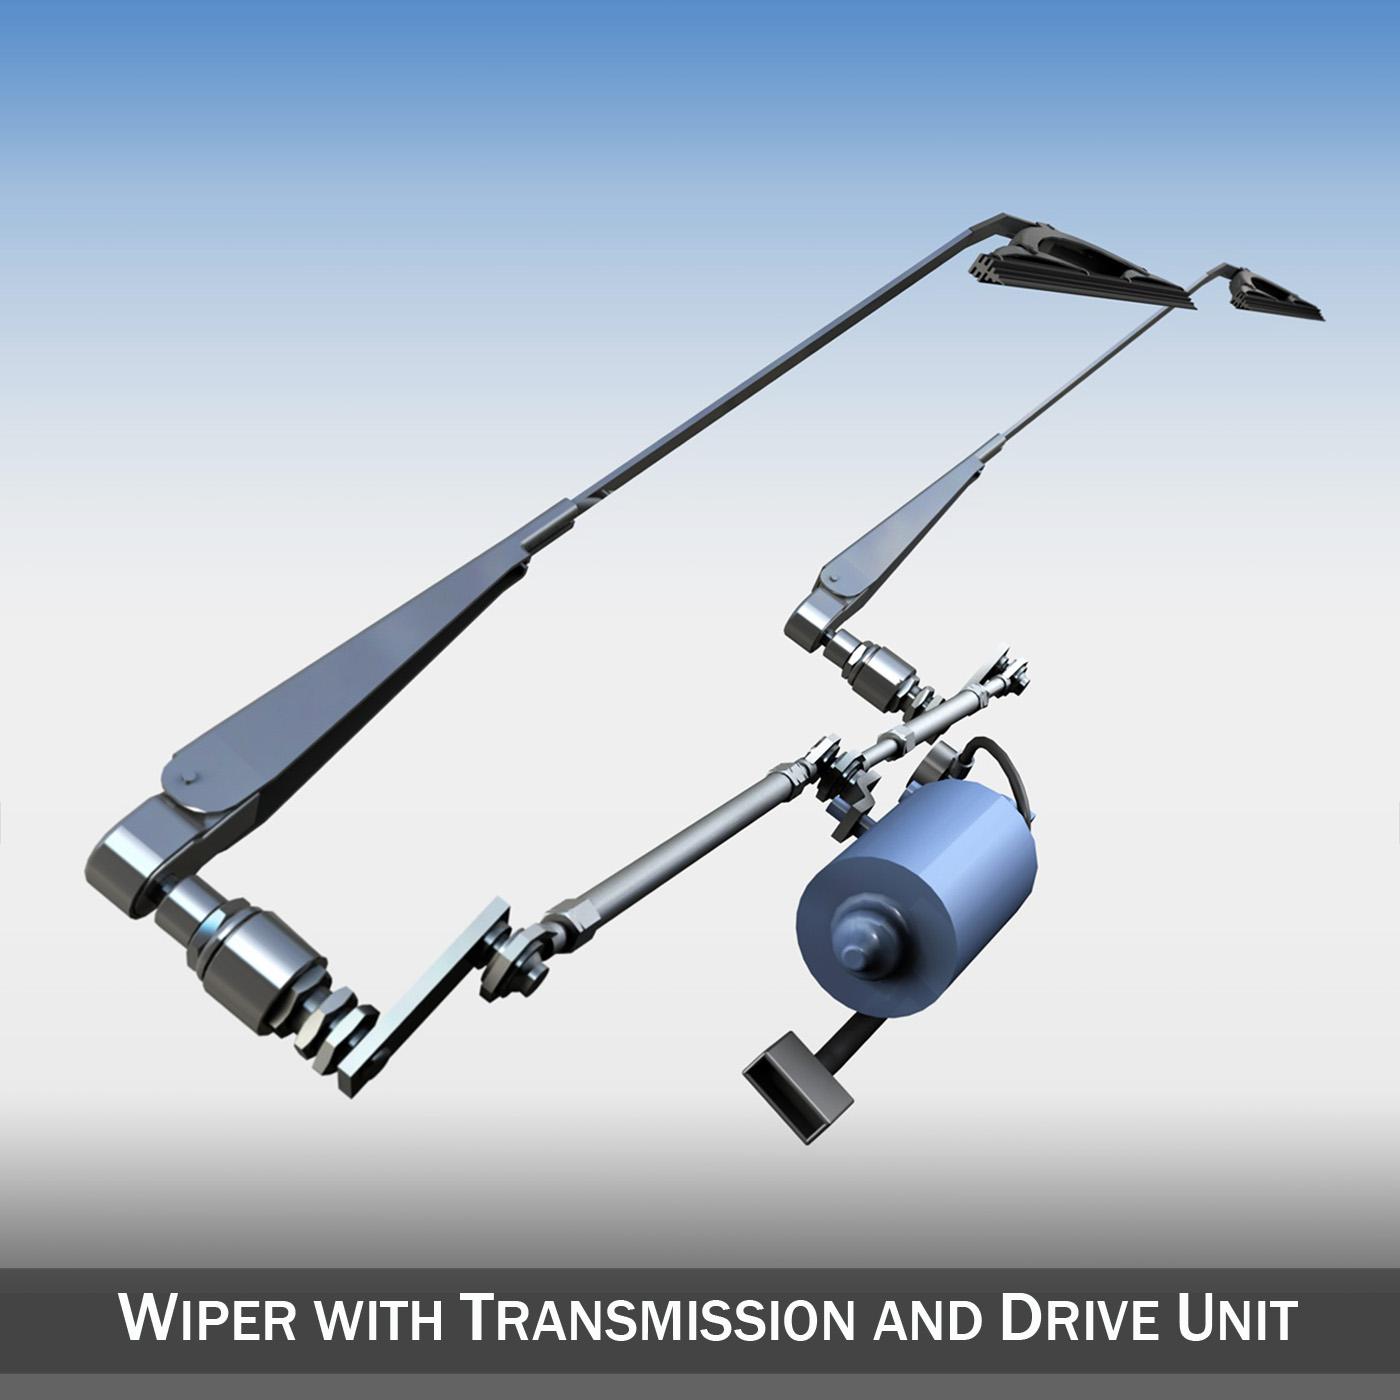 Wiper with transmission and drive unit 3d model 3ds fbx c4d lwo lws lw obj 189155